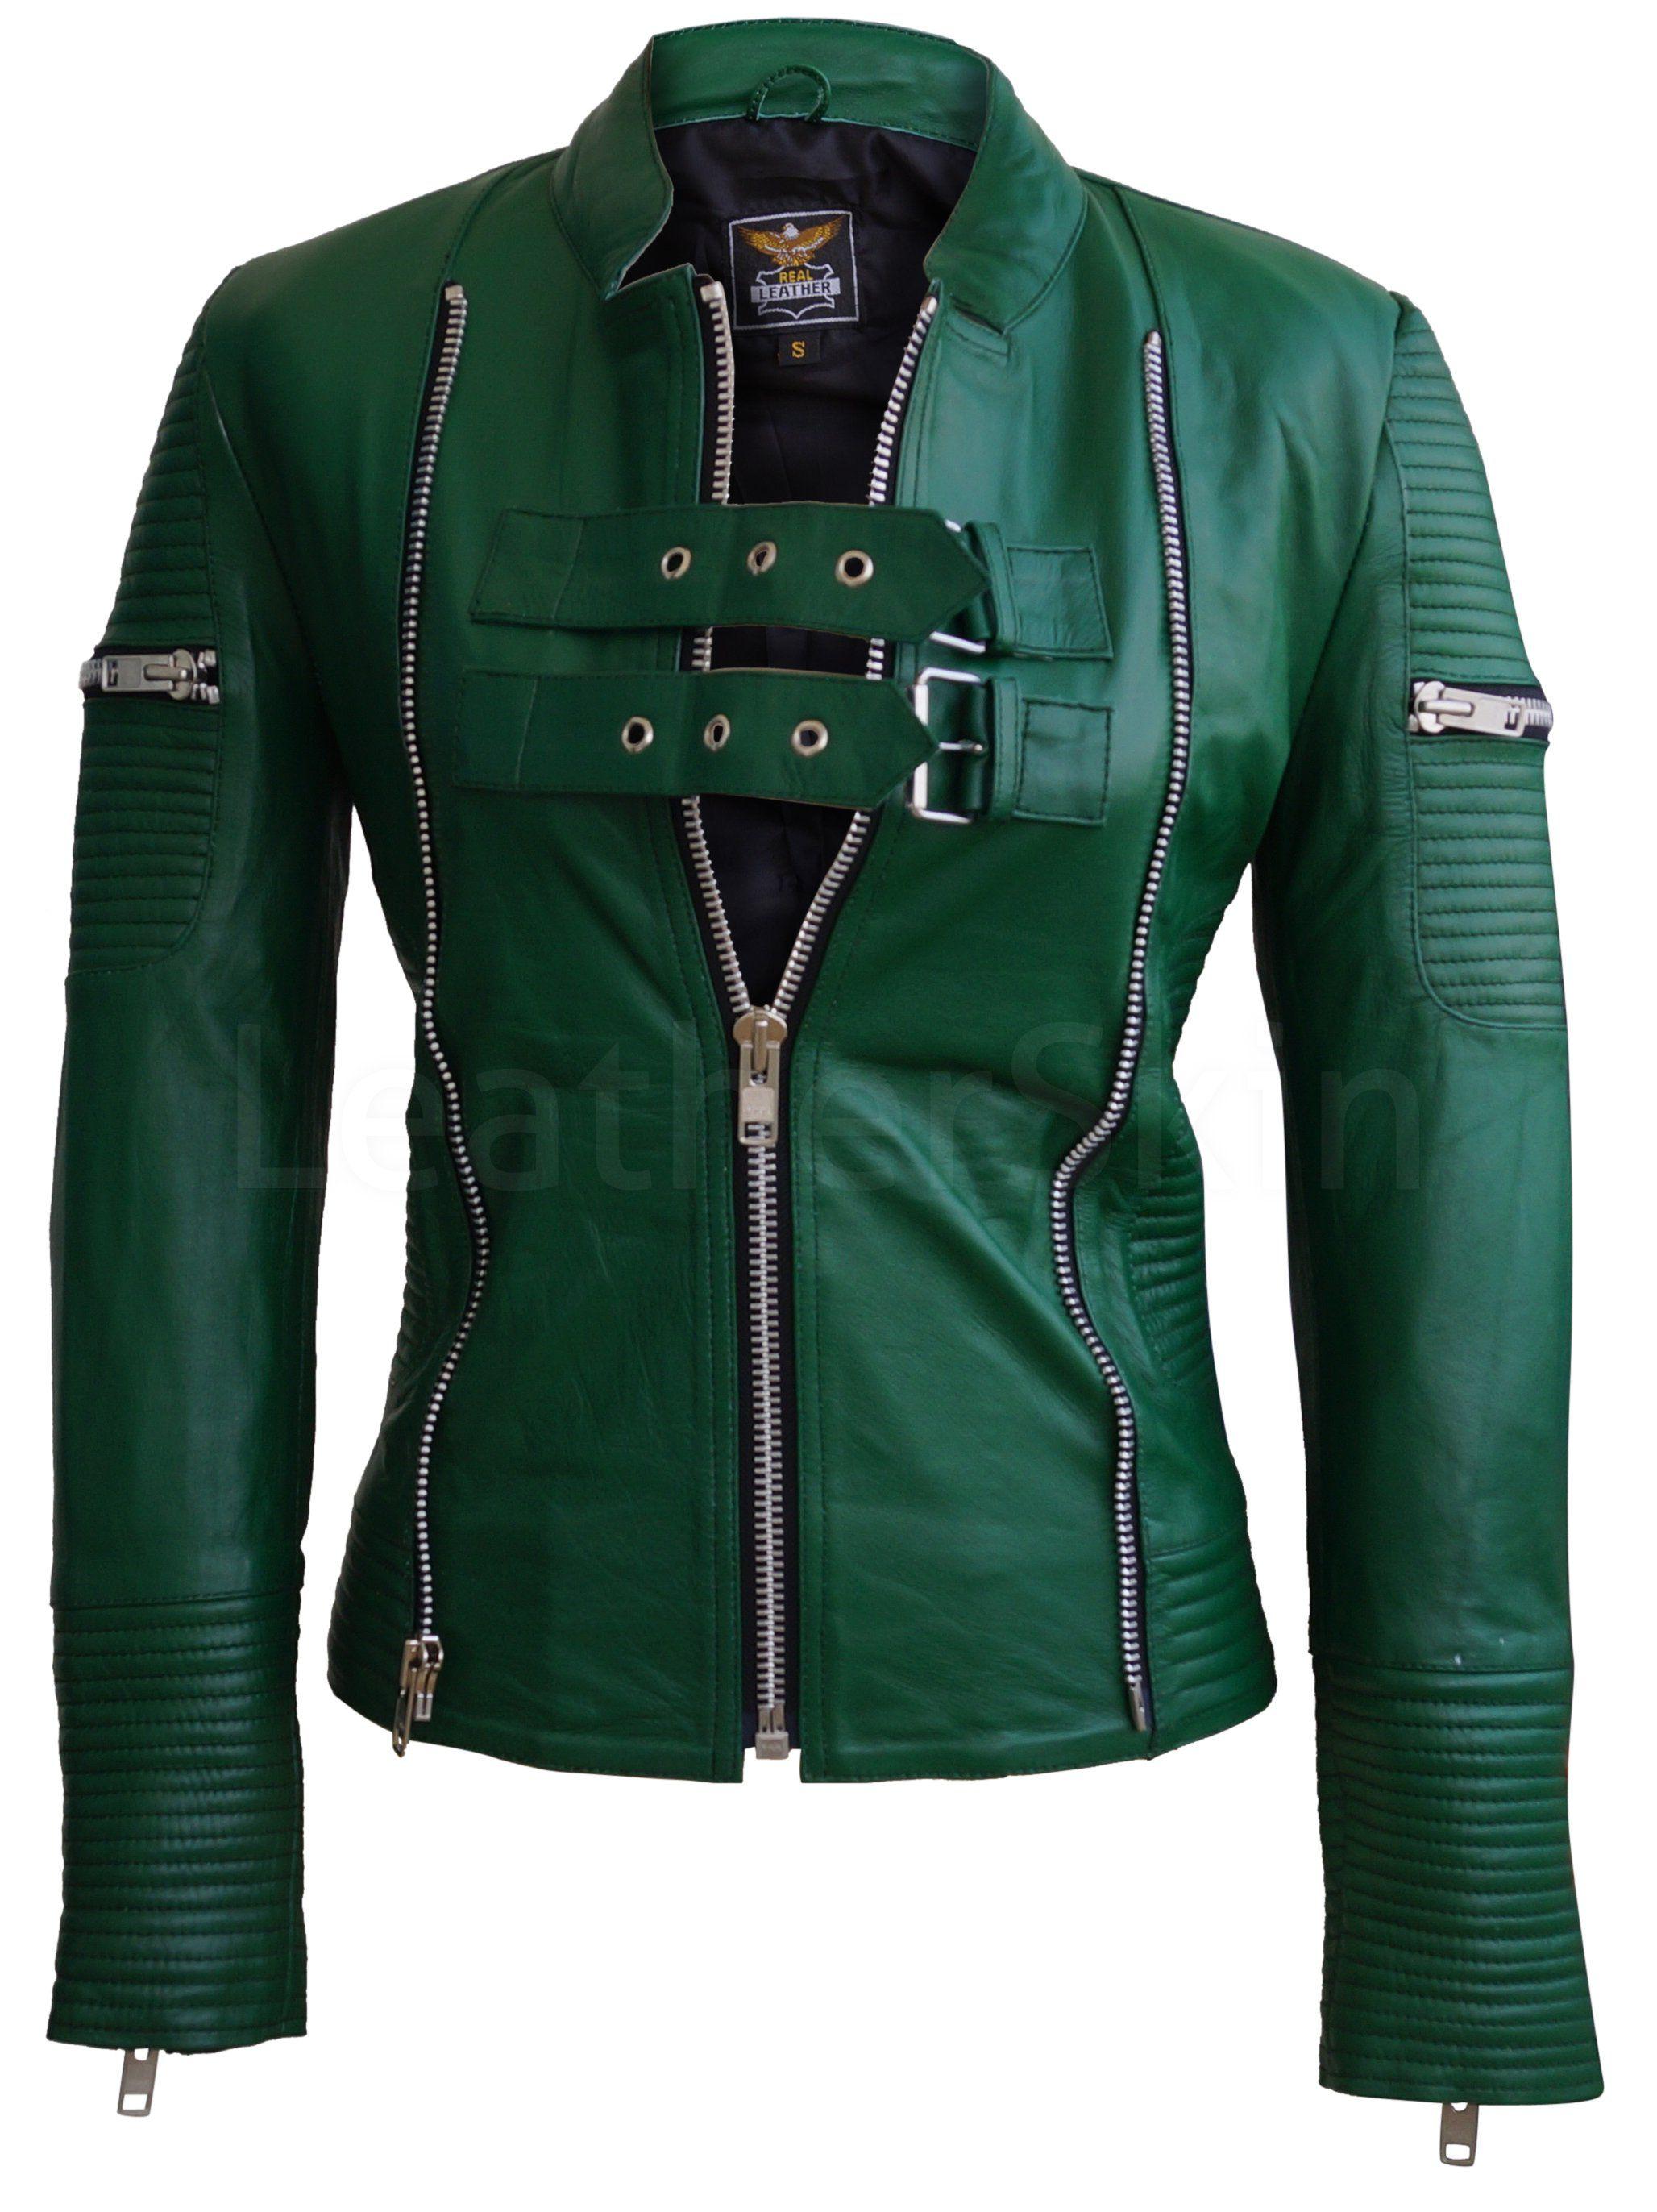 Women Green Sheep Skin Rib Quilted Genuine Leather Jacket Leather Jackets Women Green Leather Jackets Jackets For Women [ 2744 x 2056 Pixel ]